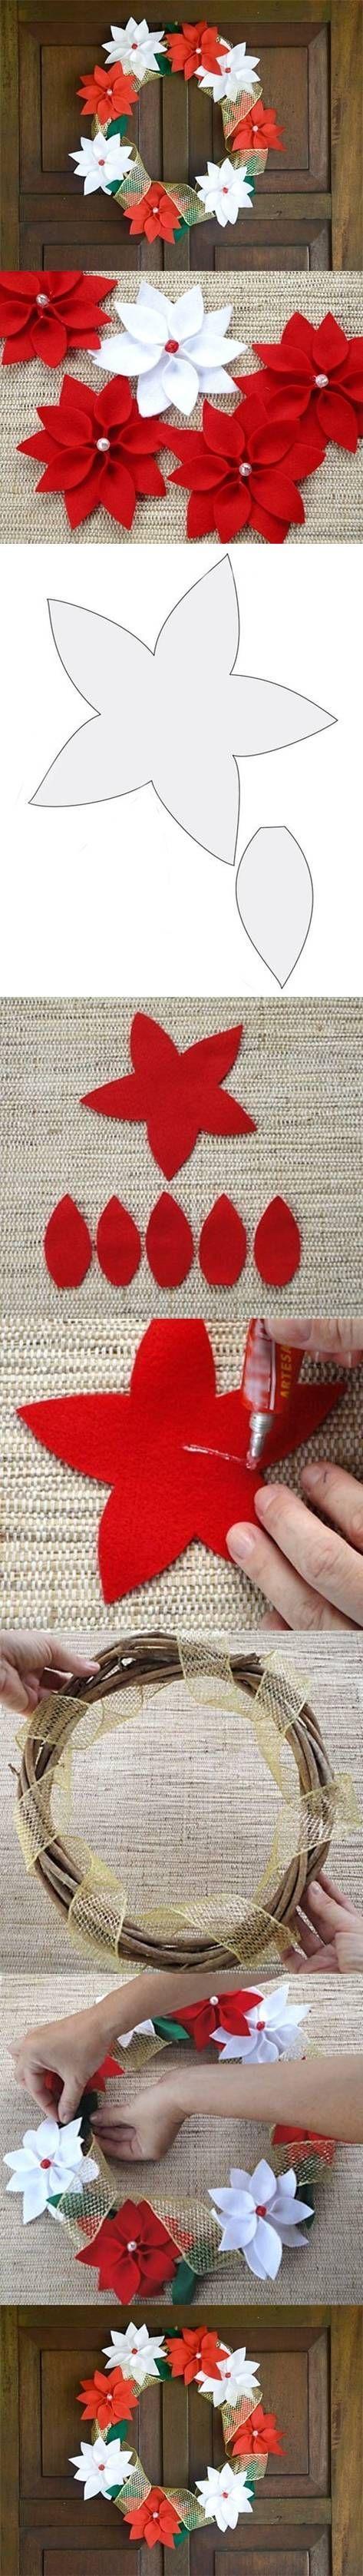 DIY Felt Christmas Wreath DIY Projects | UsefulDIY.com Follow Us on Facebook == http://www.facebook.com/UsefulDiy: